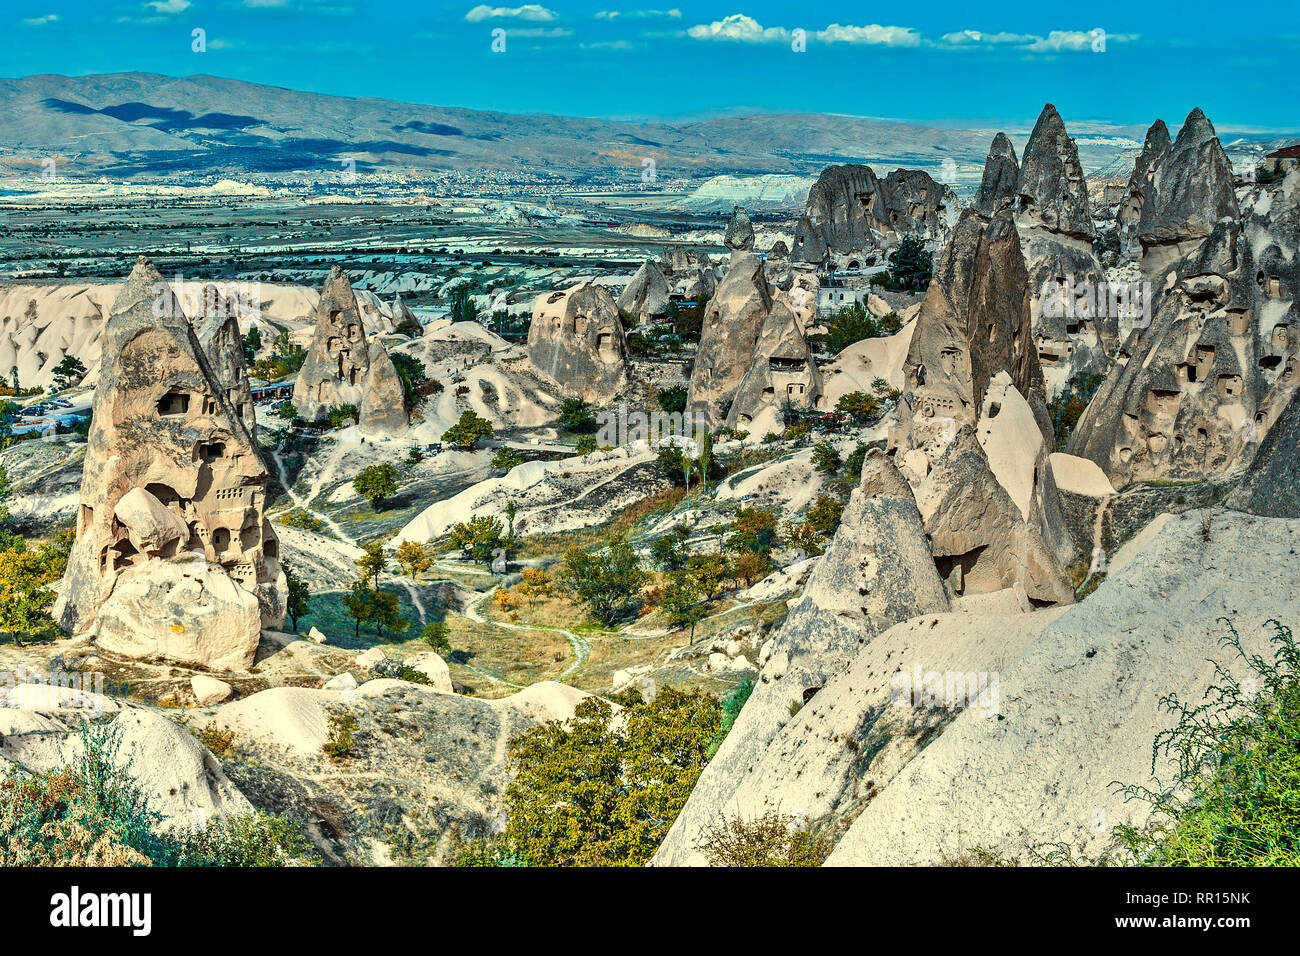 Turkey Cappadocia Rock Dwellings Stock Photo